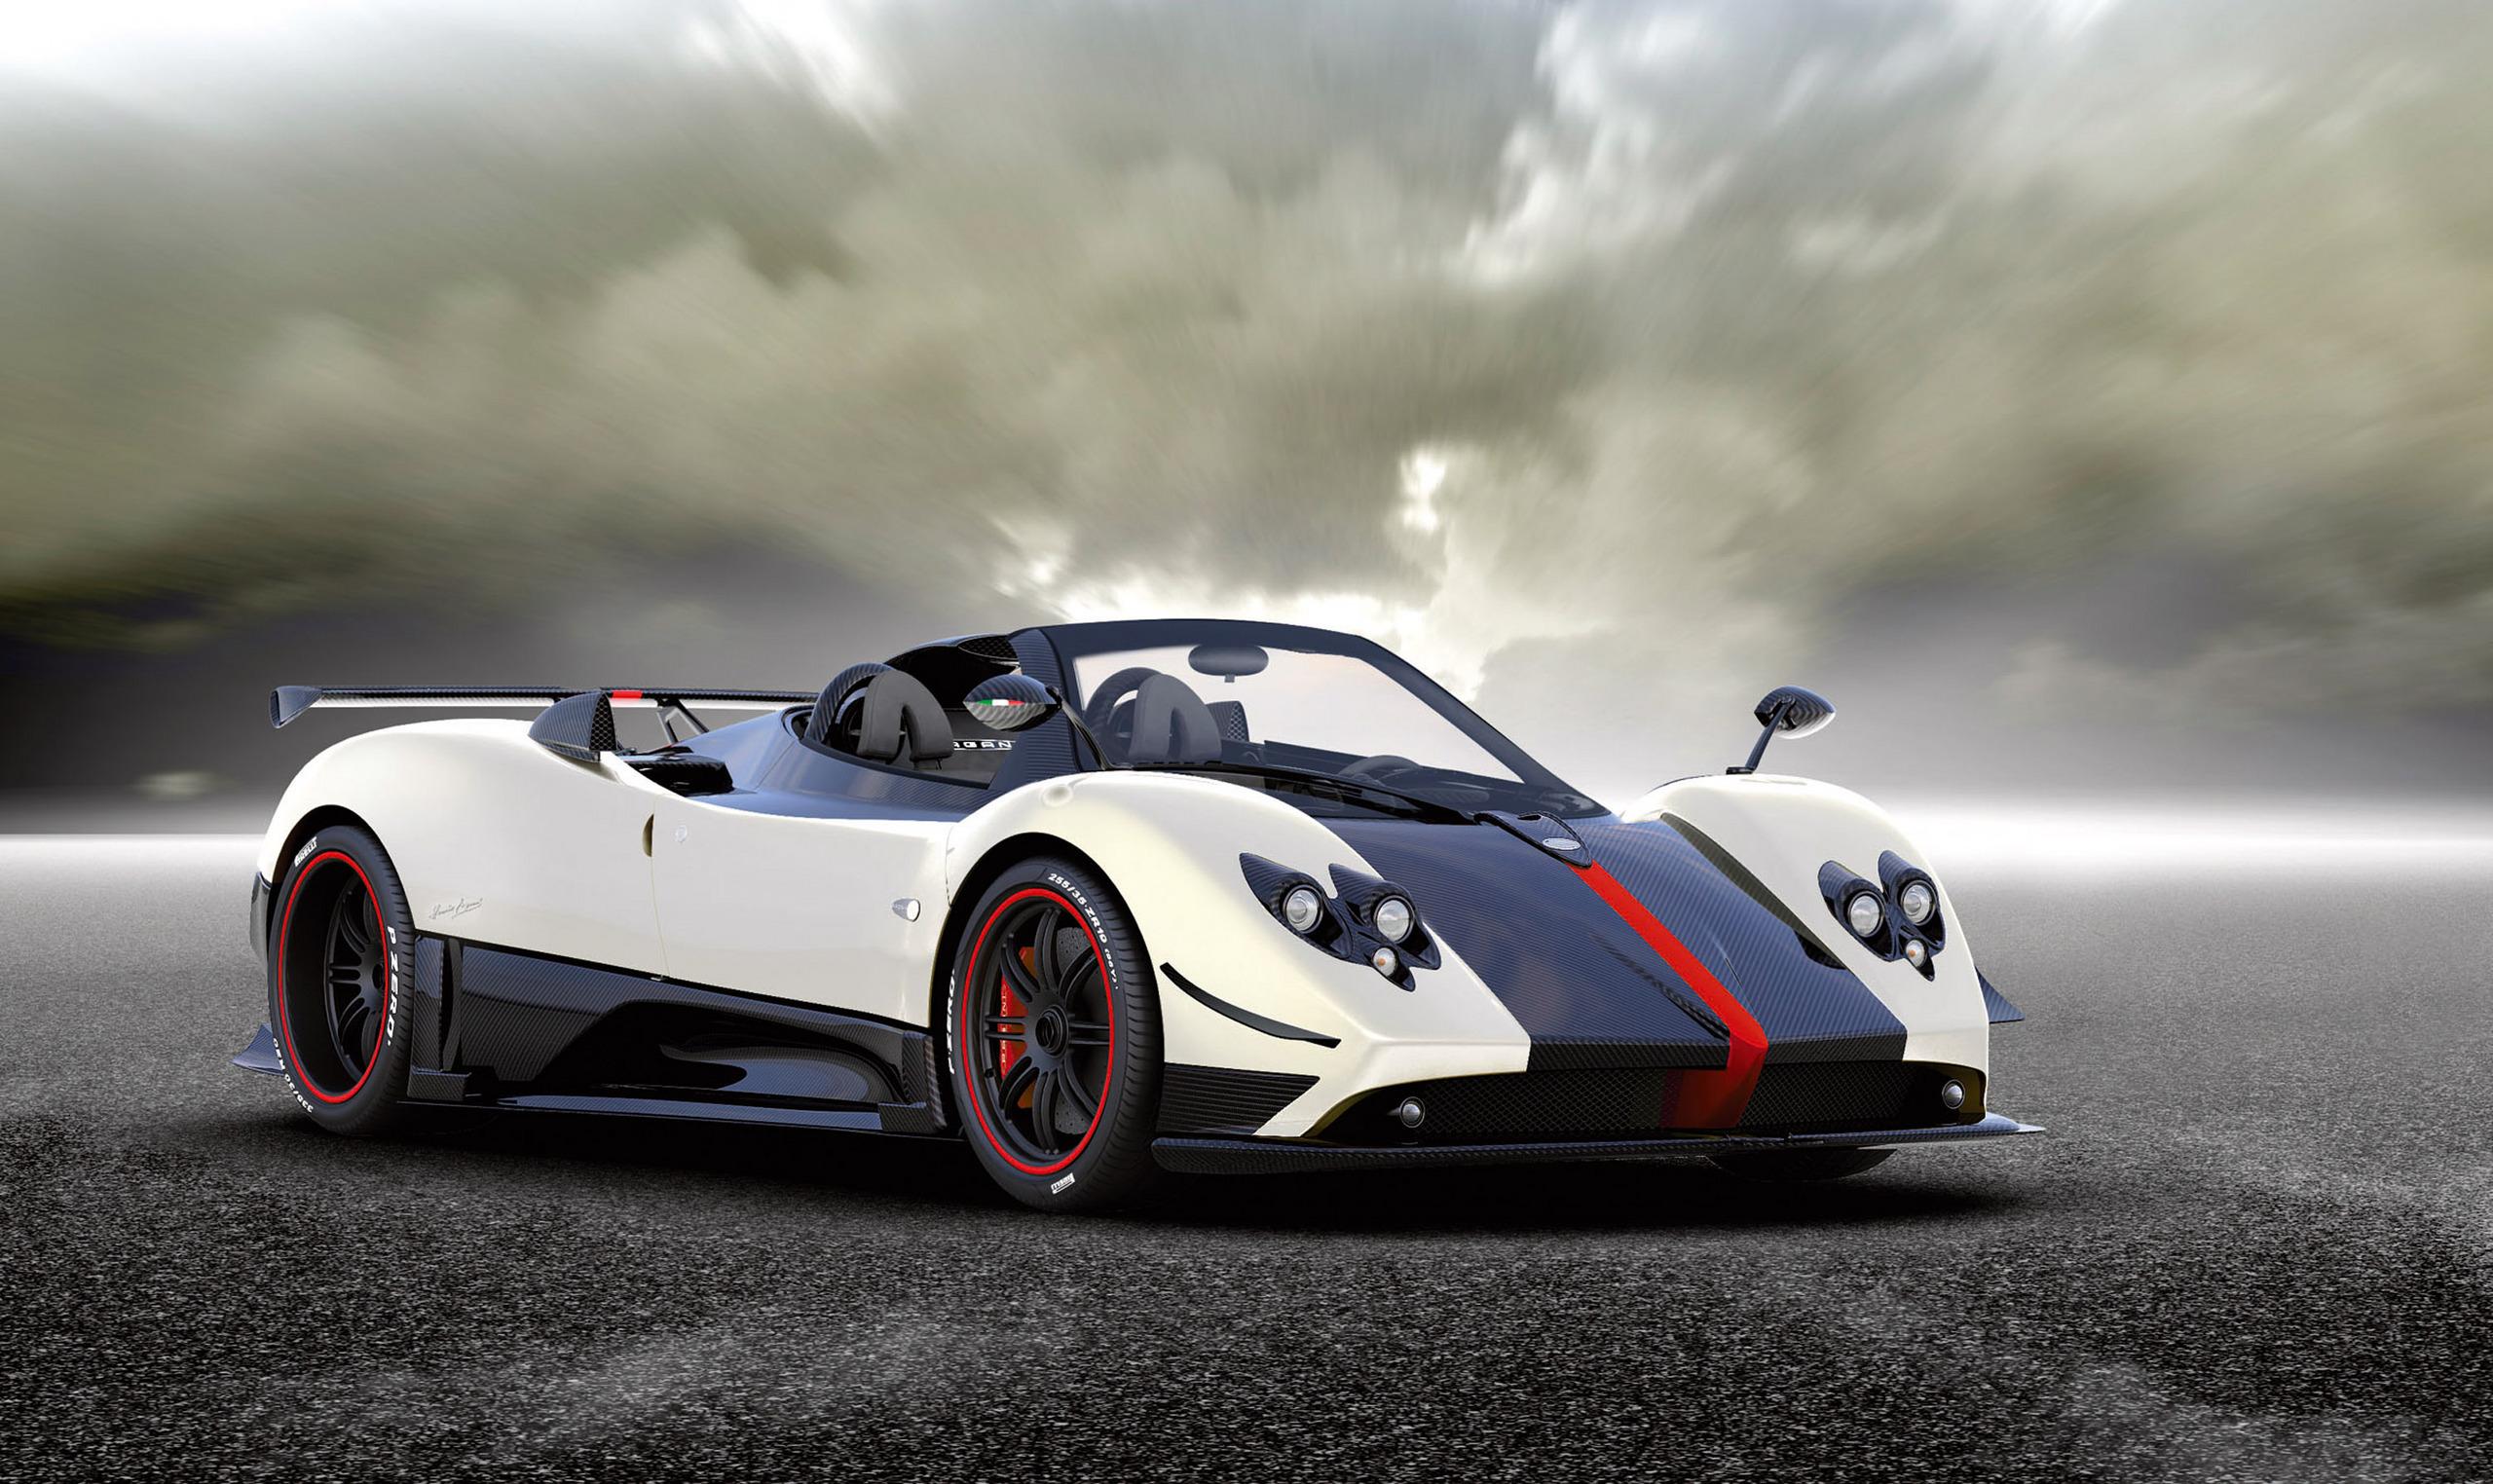 Exotic Cars Images Pagani Zonda Cinque Roadster Hd Wallpaper And